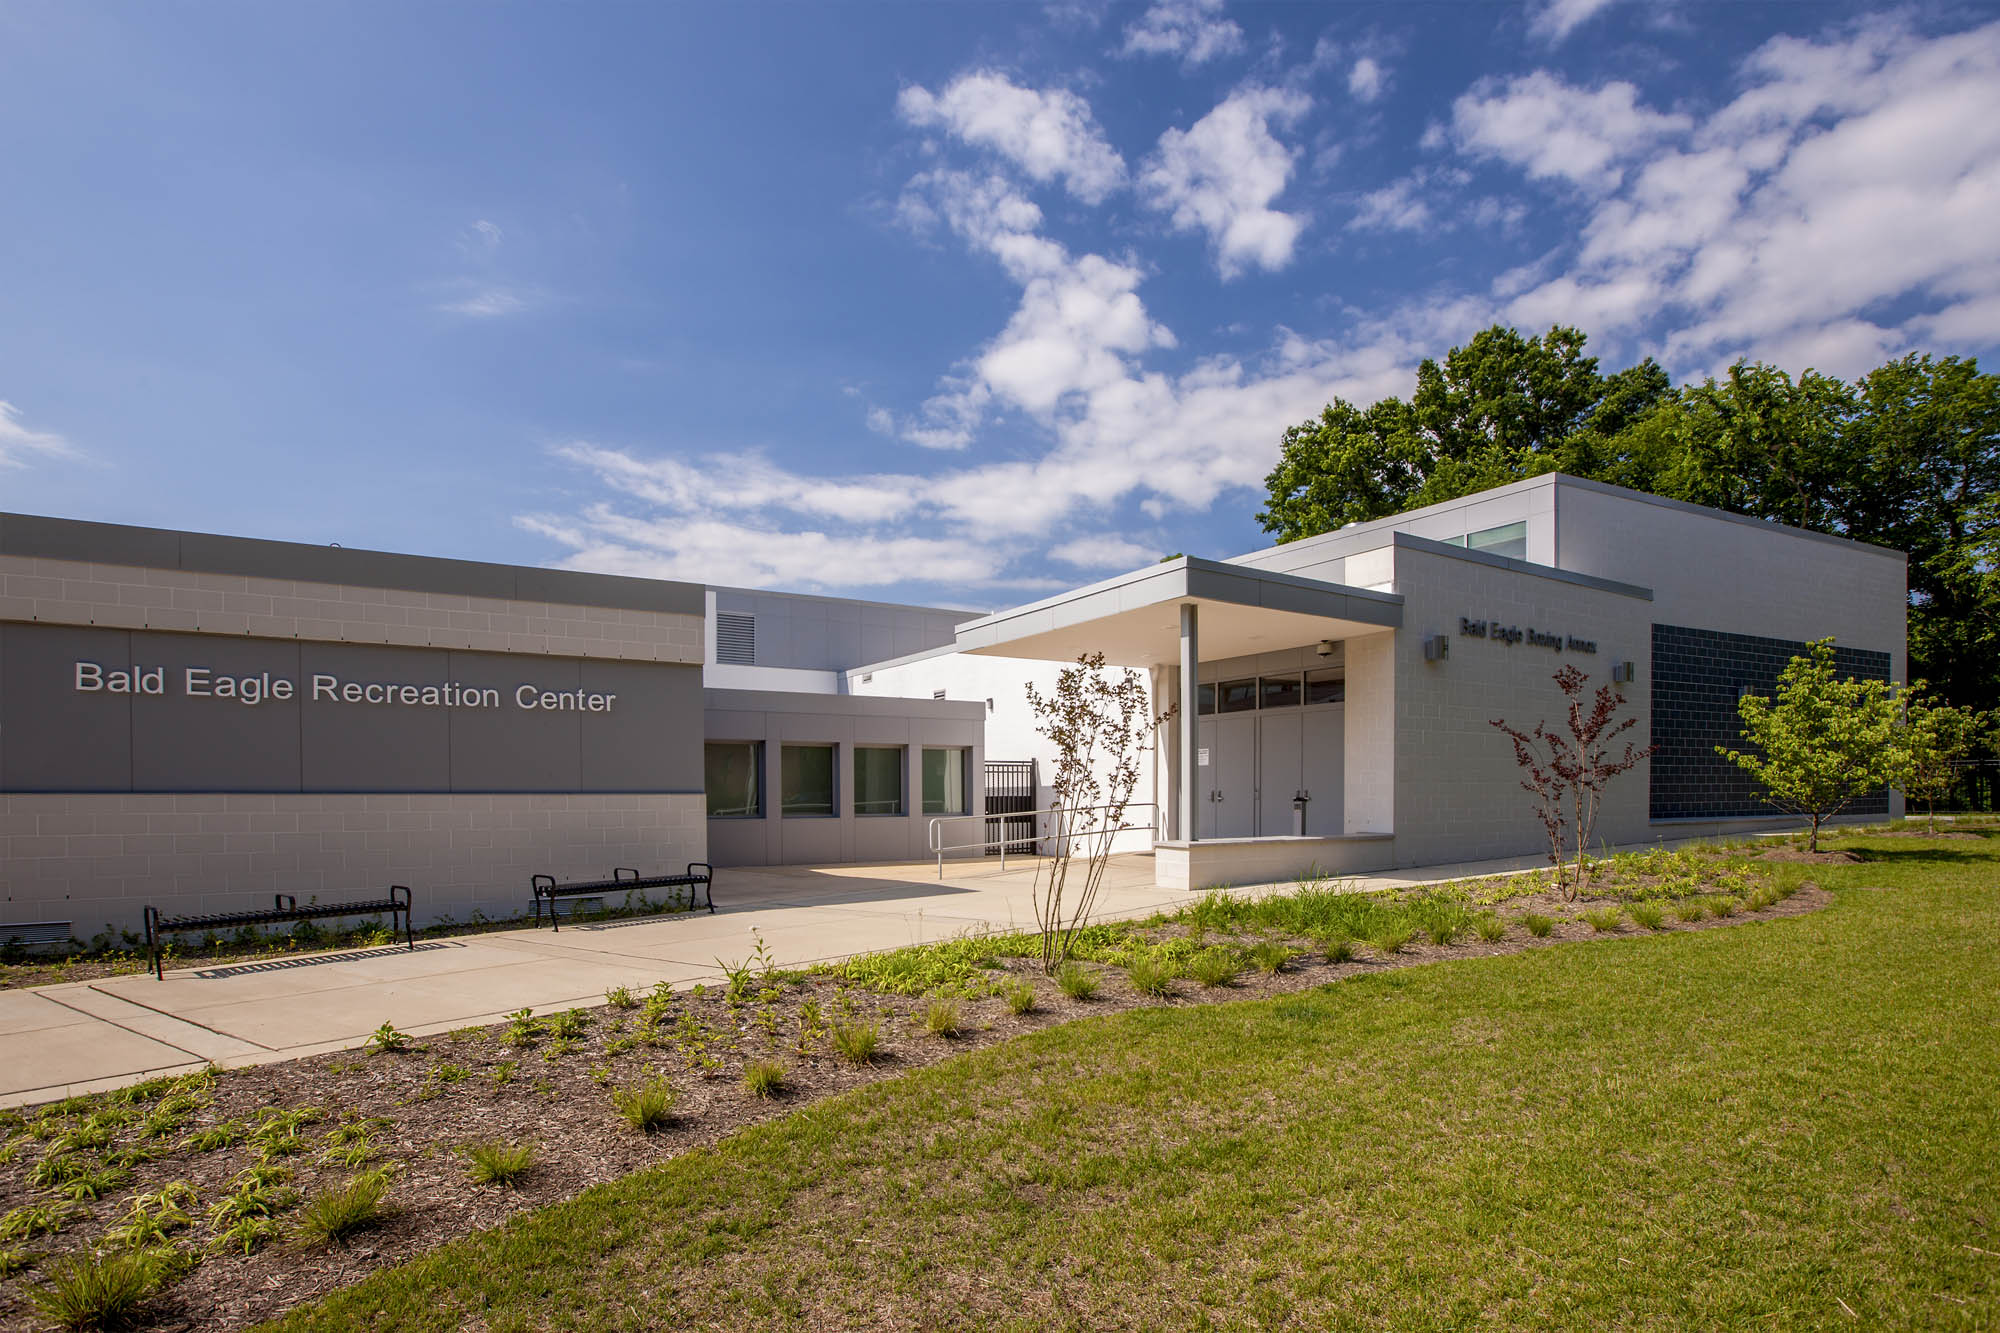 Bald Eagle Rec Center Exterior Image-146780.jpg